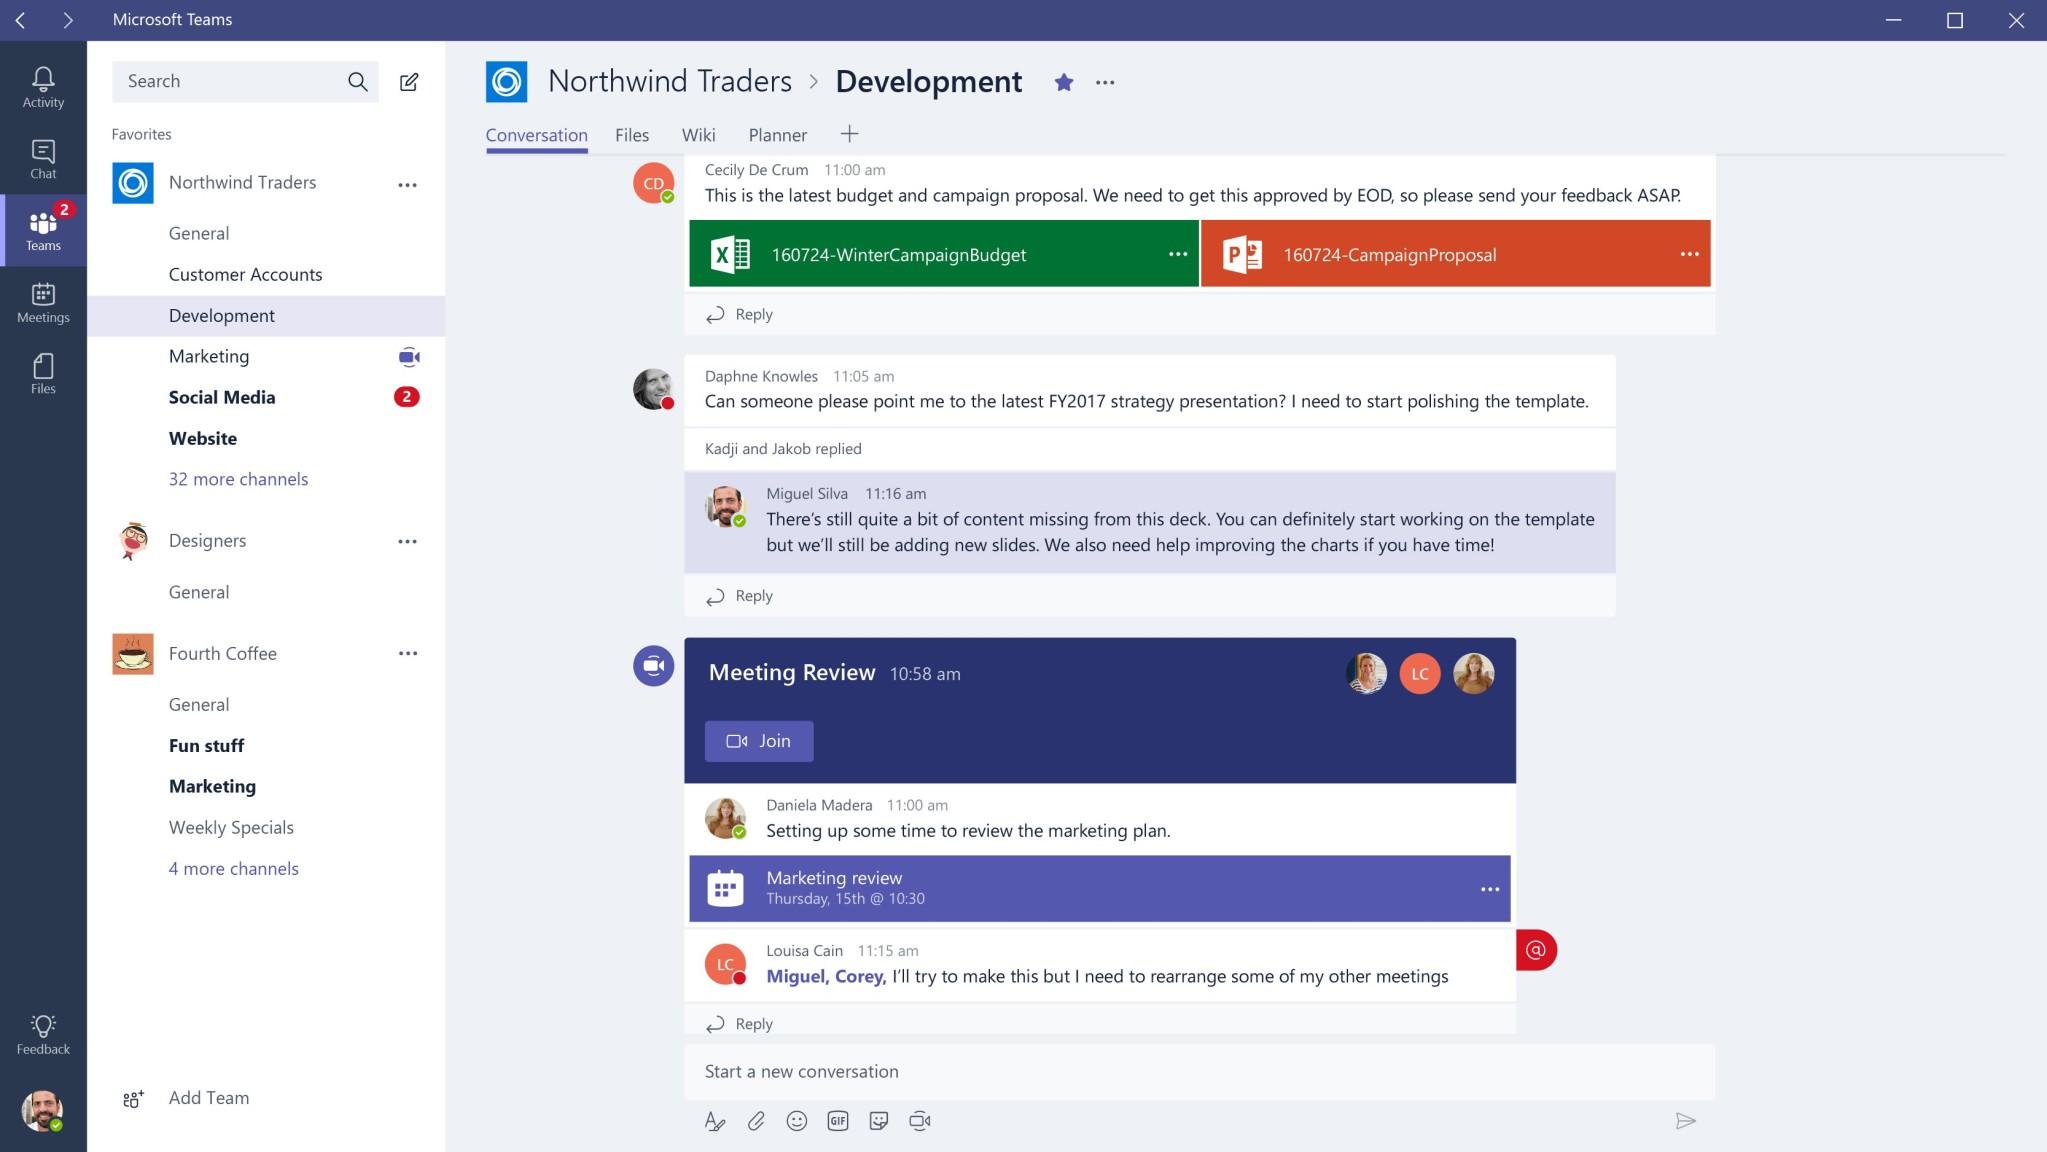 Screenshot 1 - Microsoft Teams